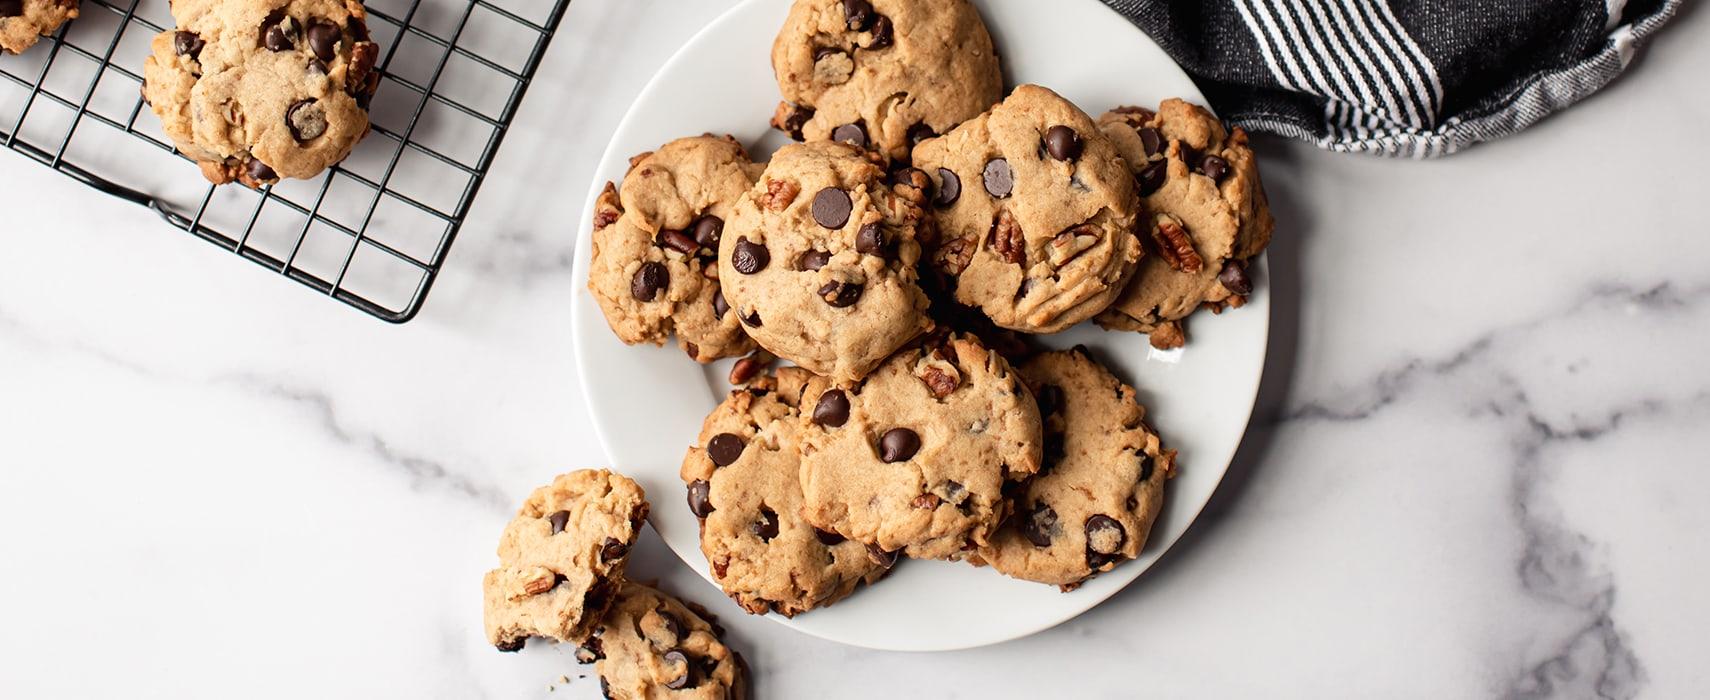 Cookies auf Teller